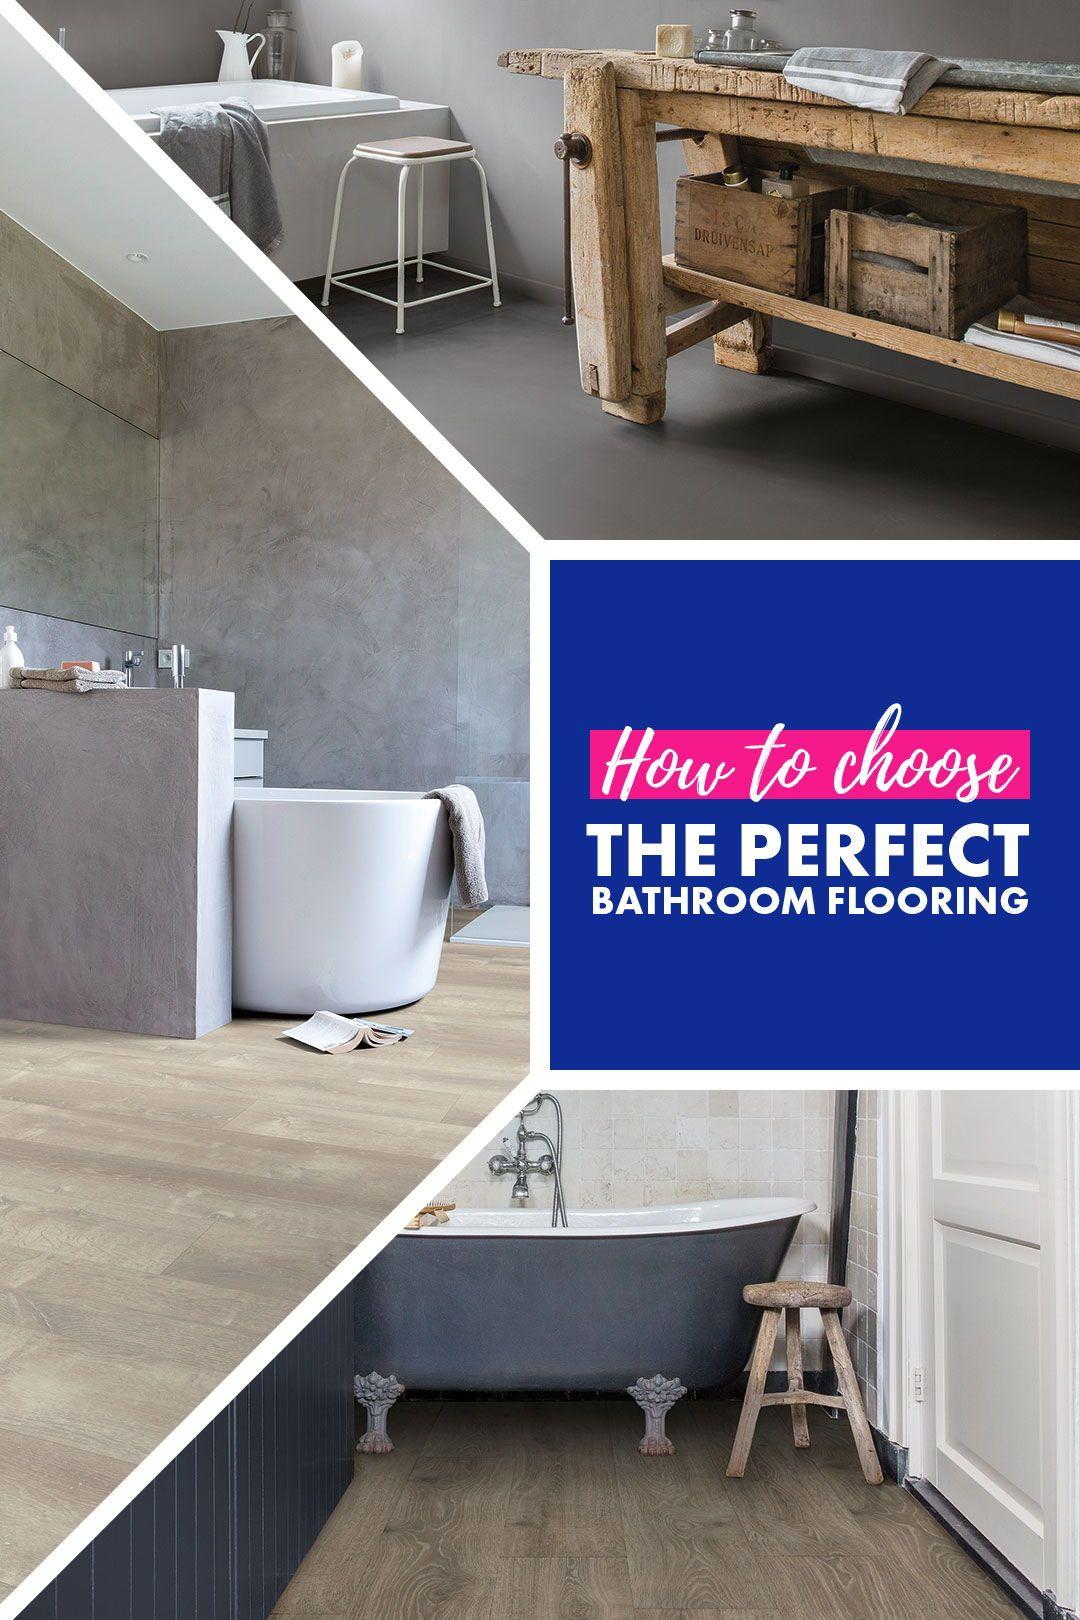 Choose the perfect bathroom floor QuickStep.co.uk